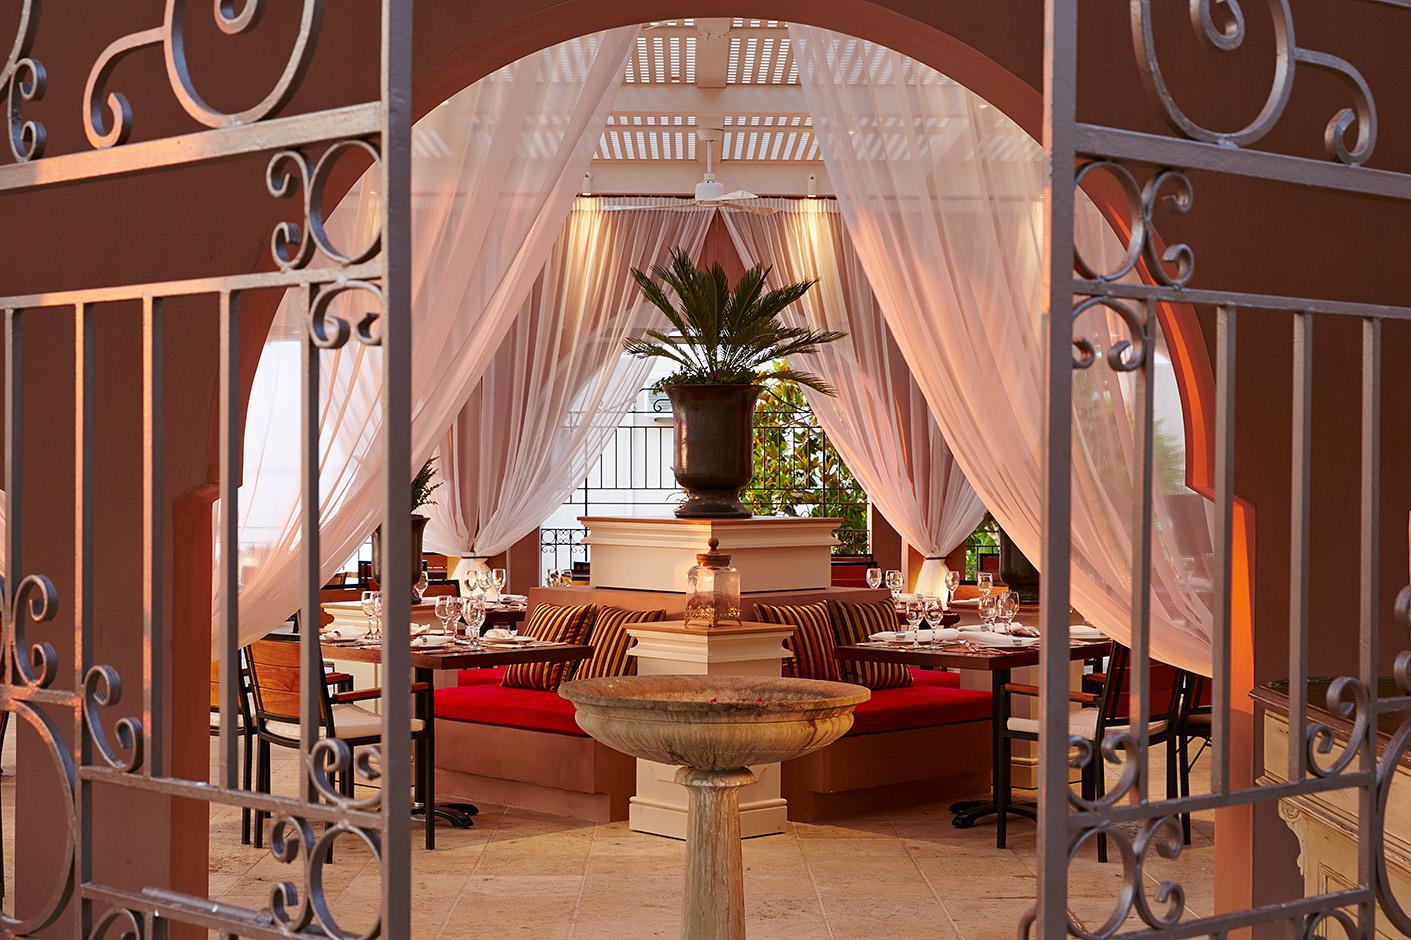 Hotel Marbella Corfou Restaurant Comodo